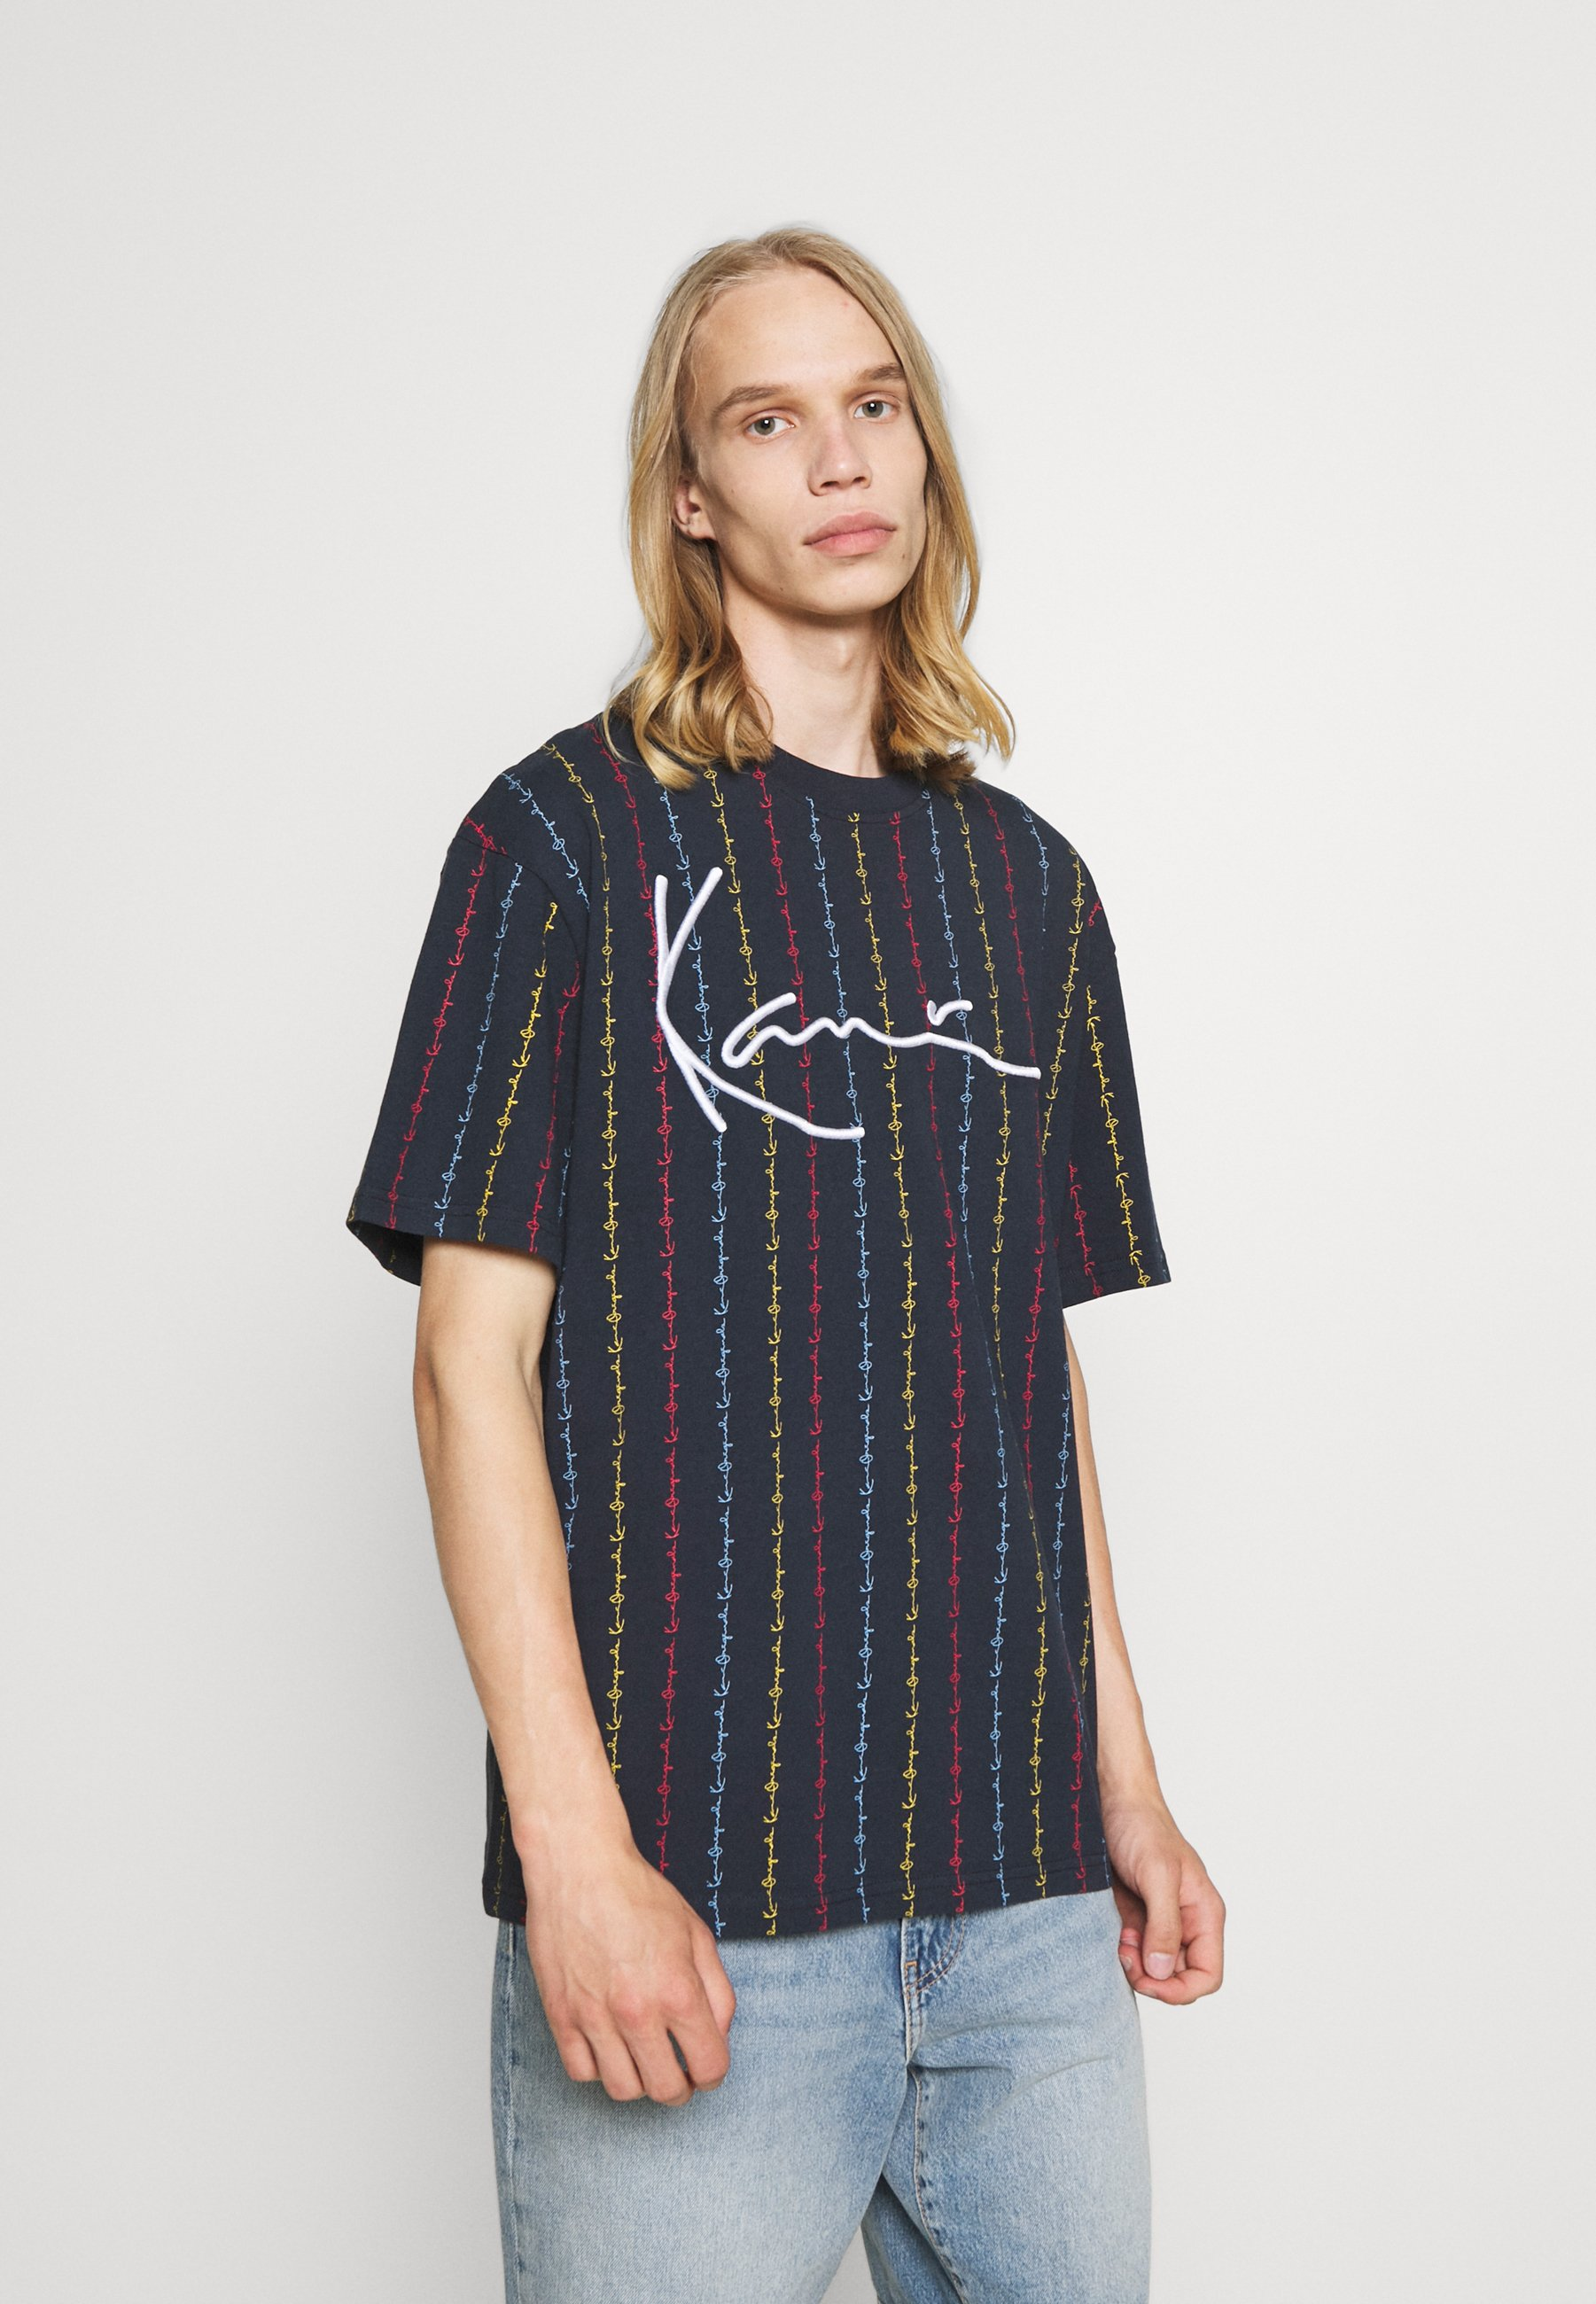 Homme UNISEX SIGNATURE LOGO PINSTRIPE TEE - T-shirt imprimé